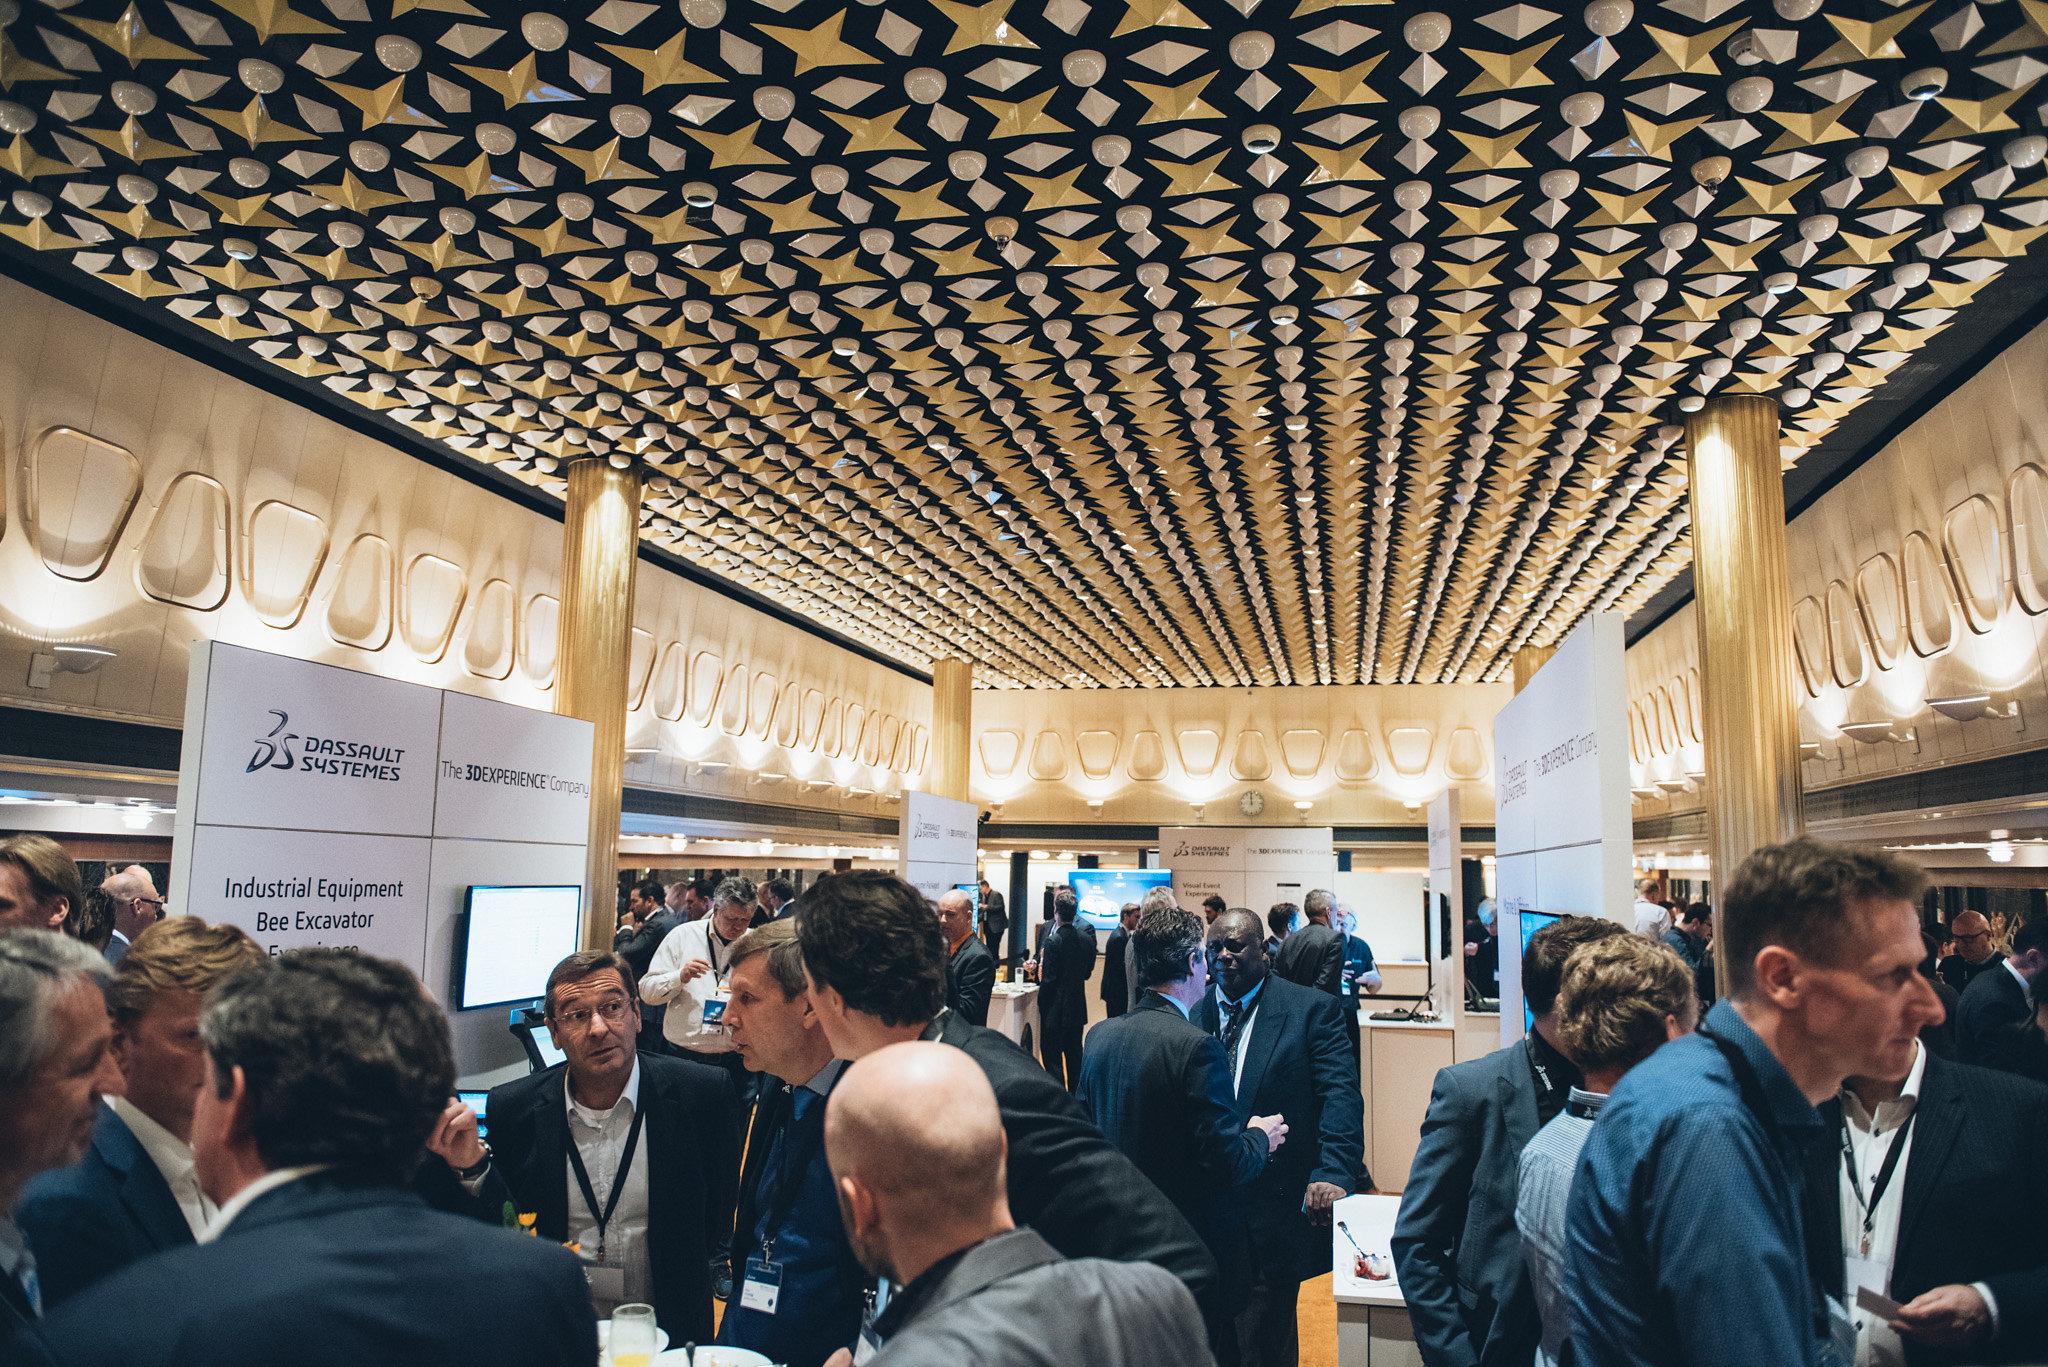 3DX_forum_event_highlights_rotterdam_networking-57.jpg